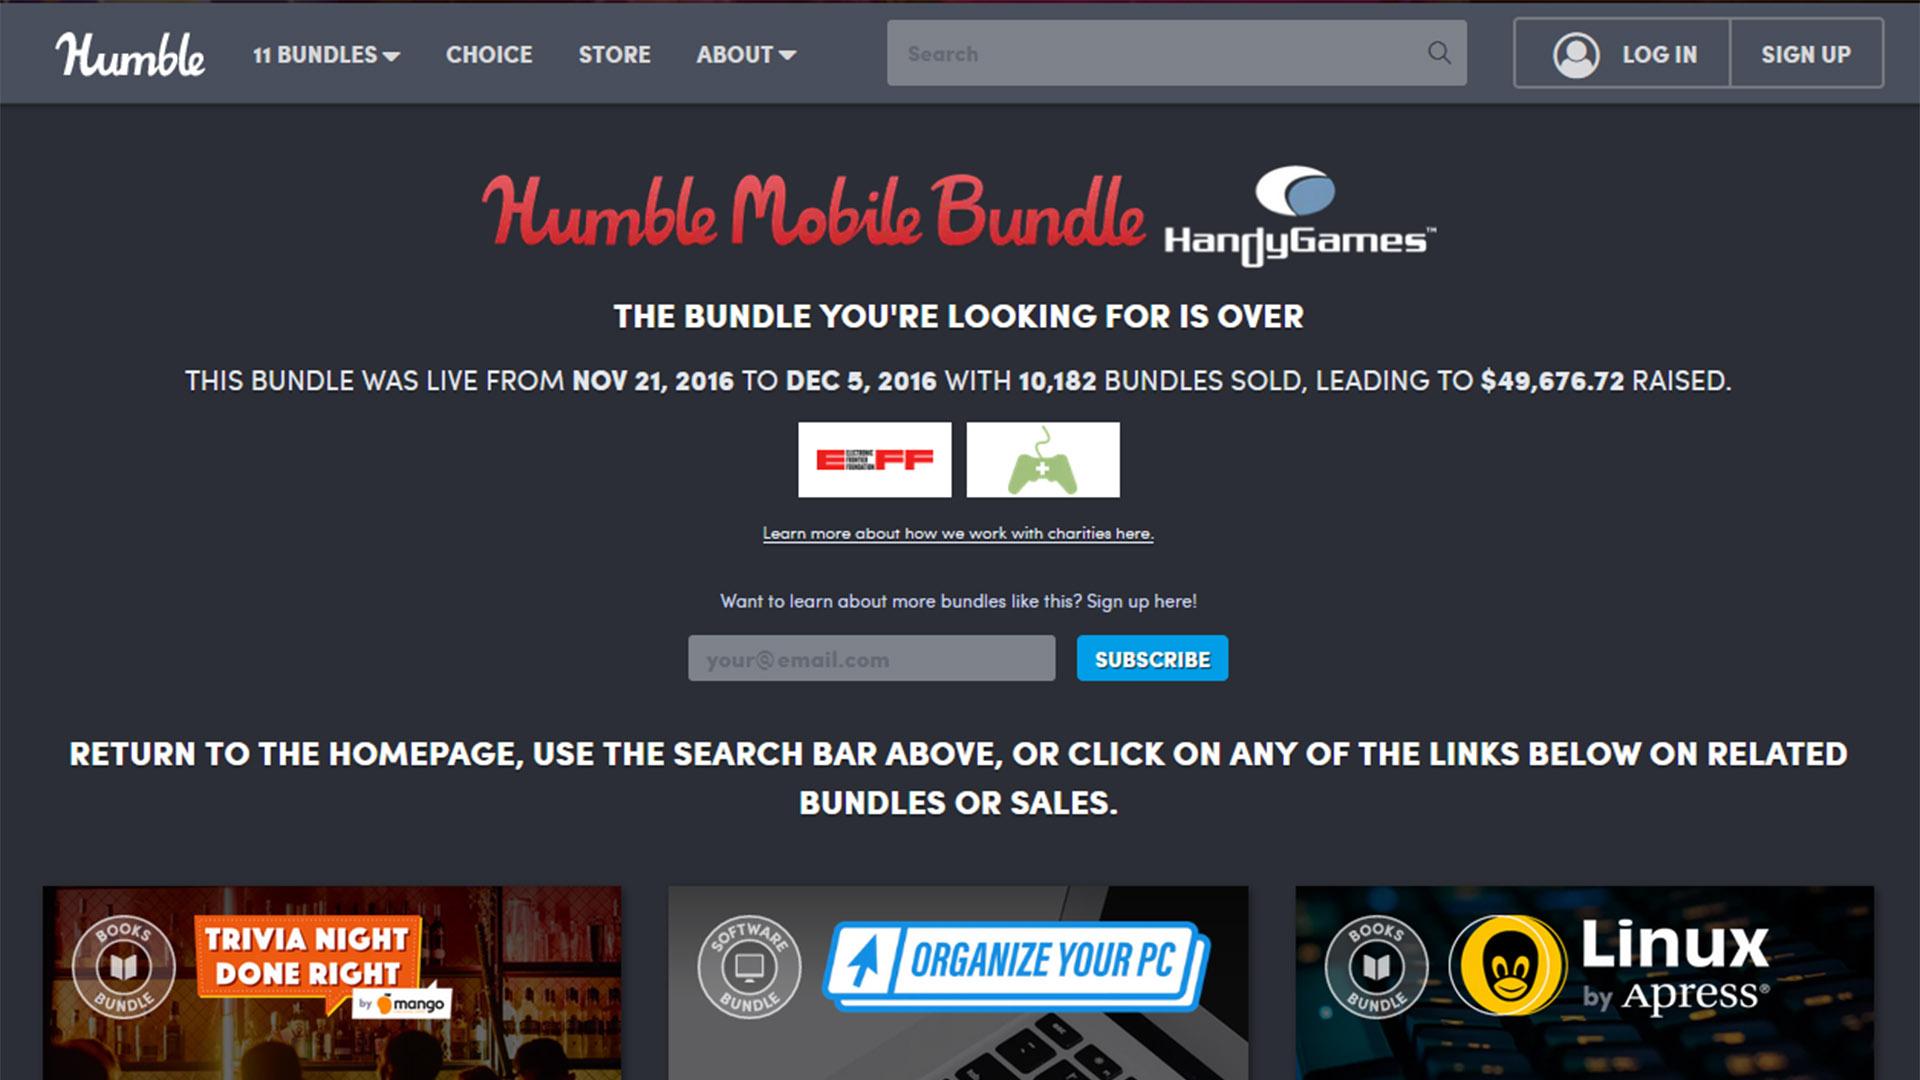 Humble Mobile Bundle screenshot 2021